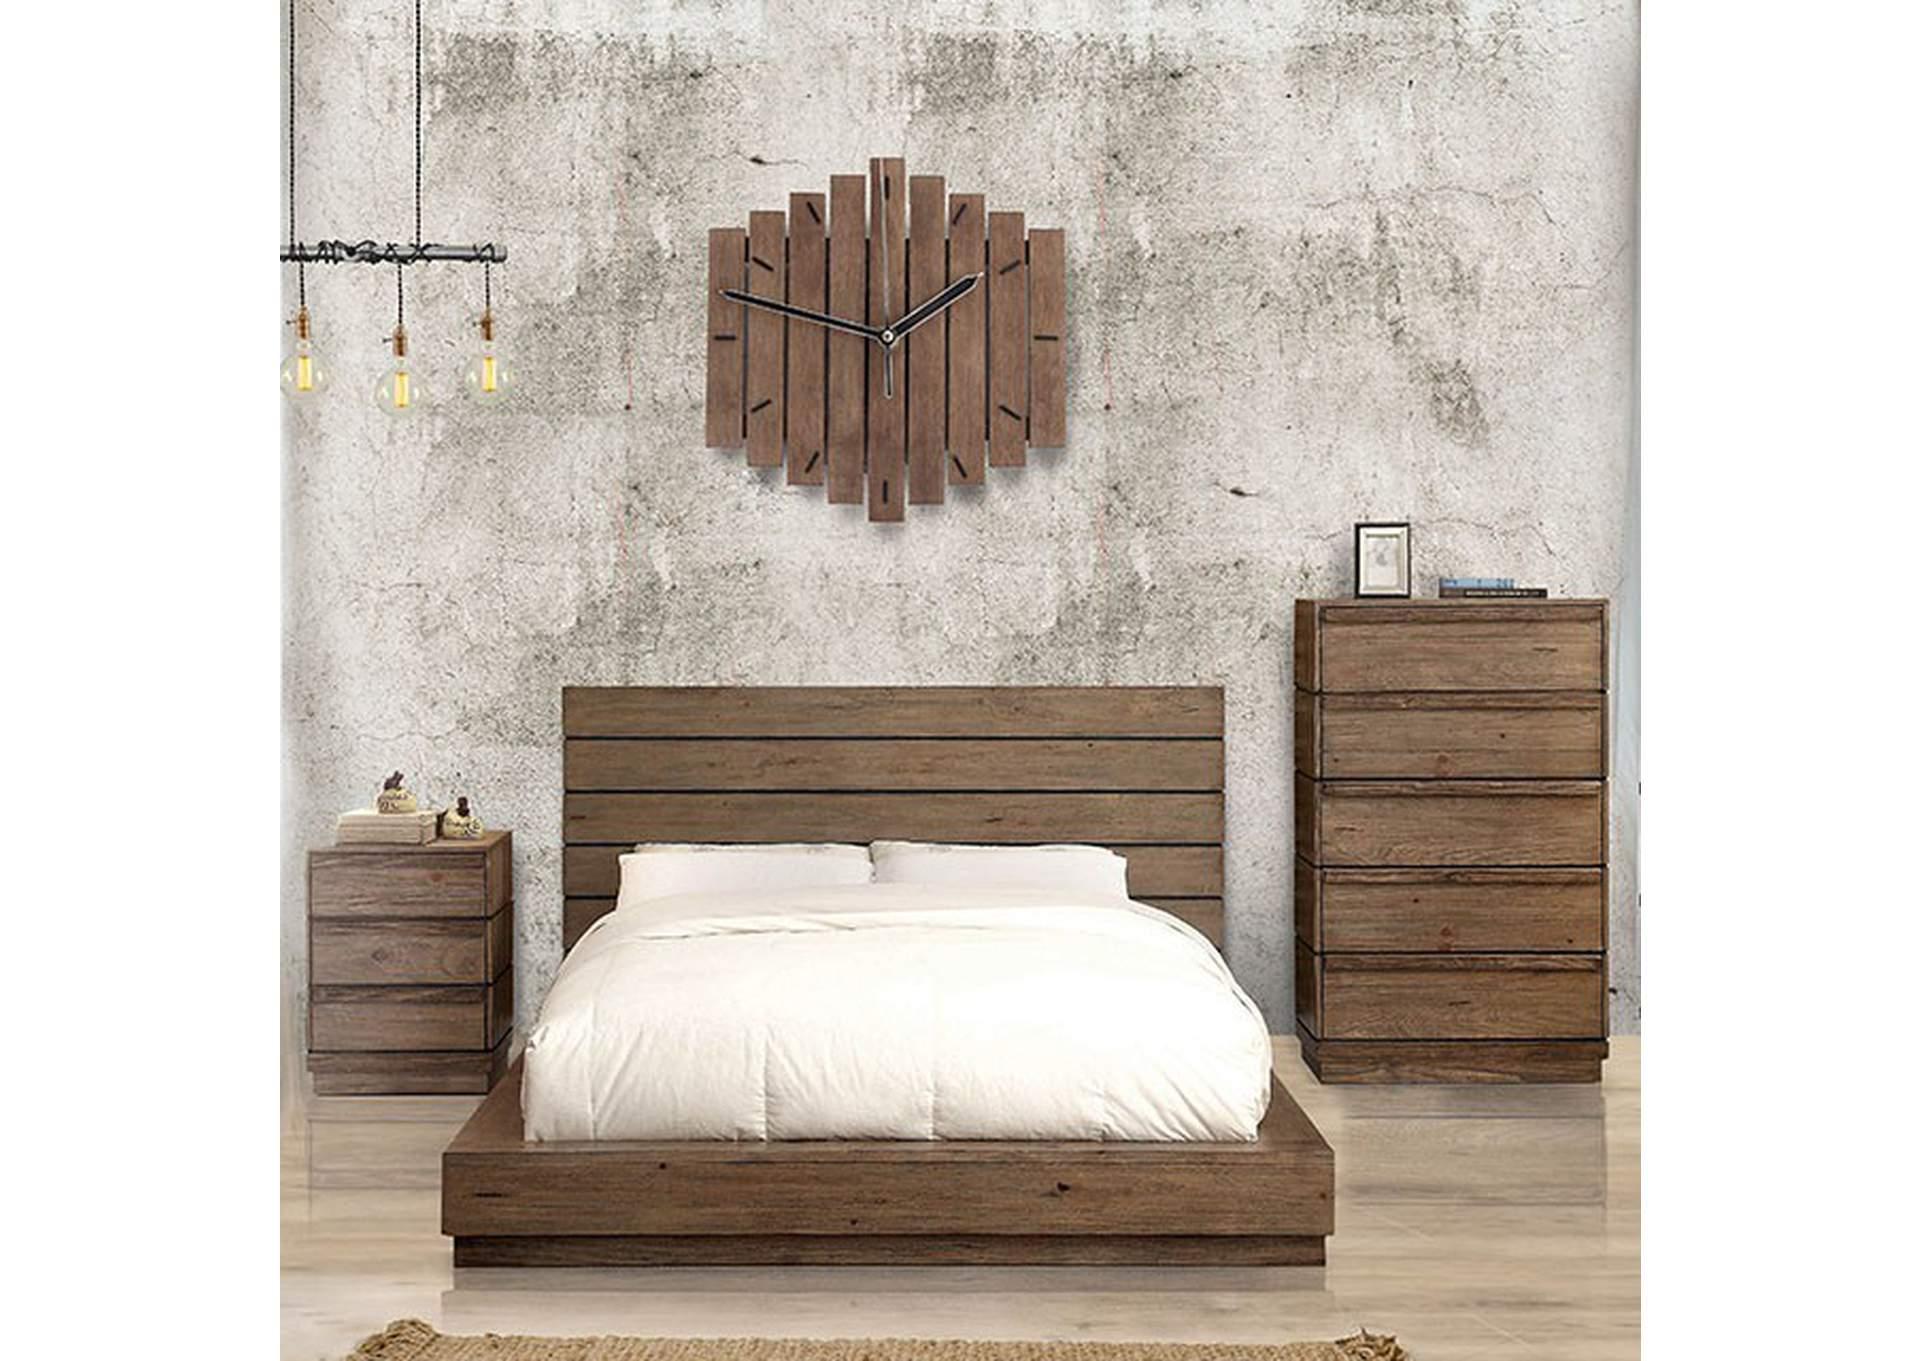 Coimbra Rustic Natural Tone California King Platform Bed Dream Decor Furniture